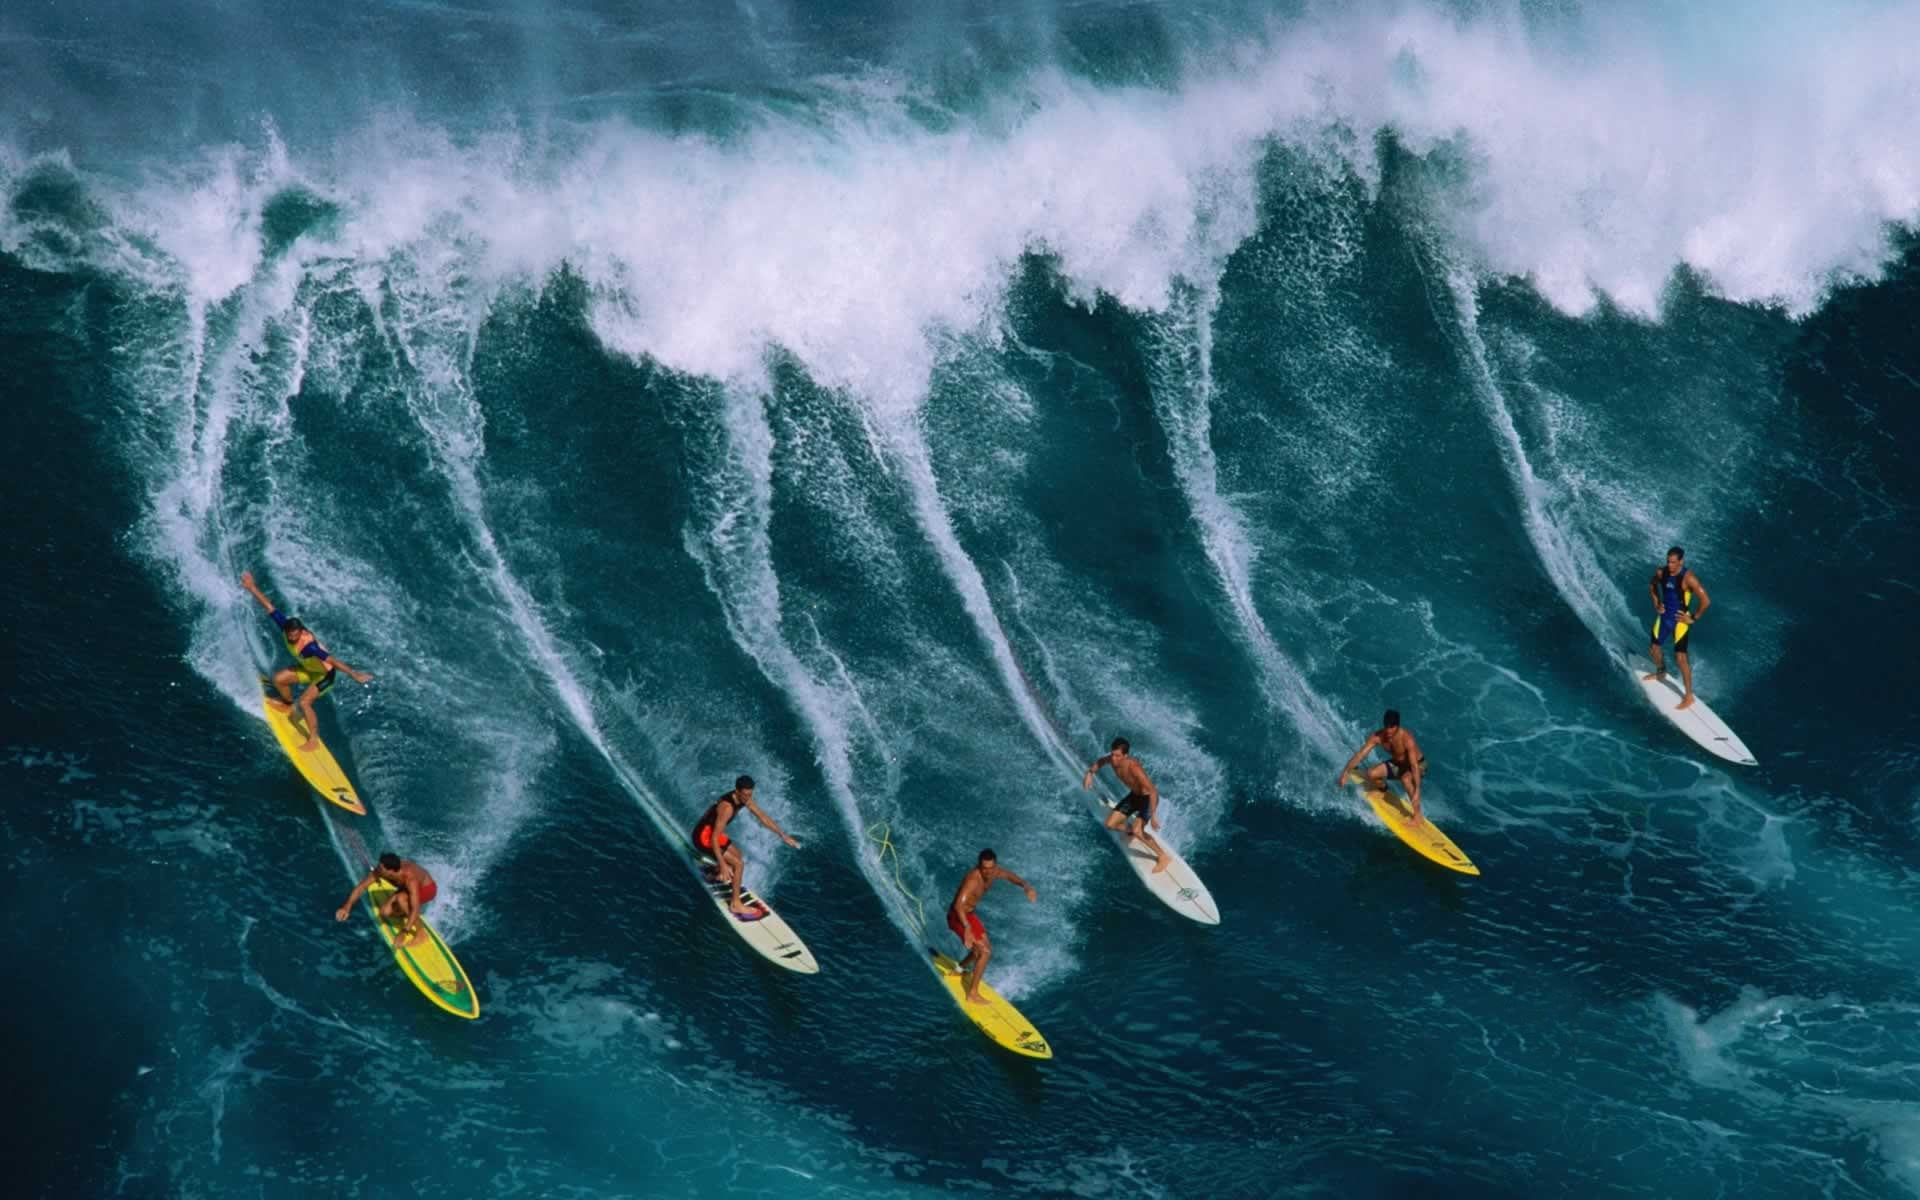 Surfer at Twilight, Hawaii бесплатно